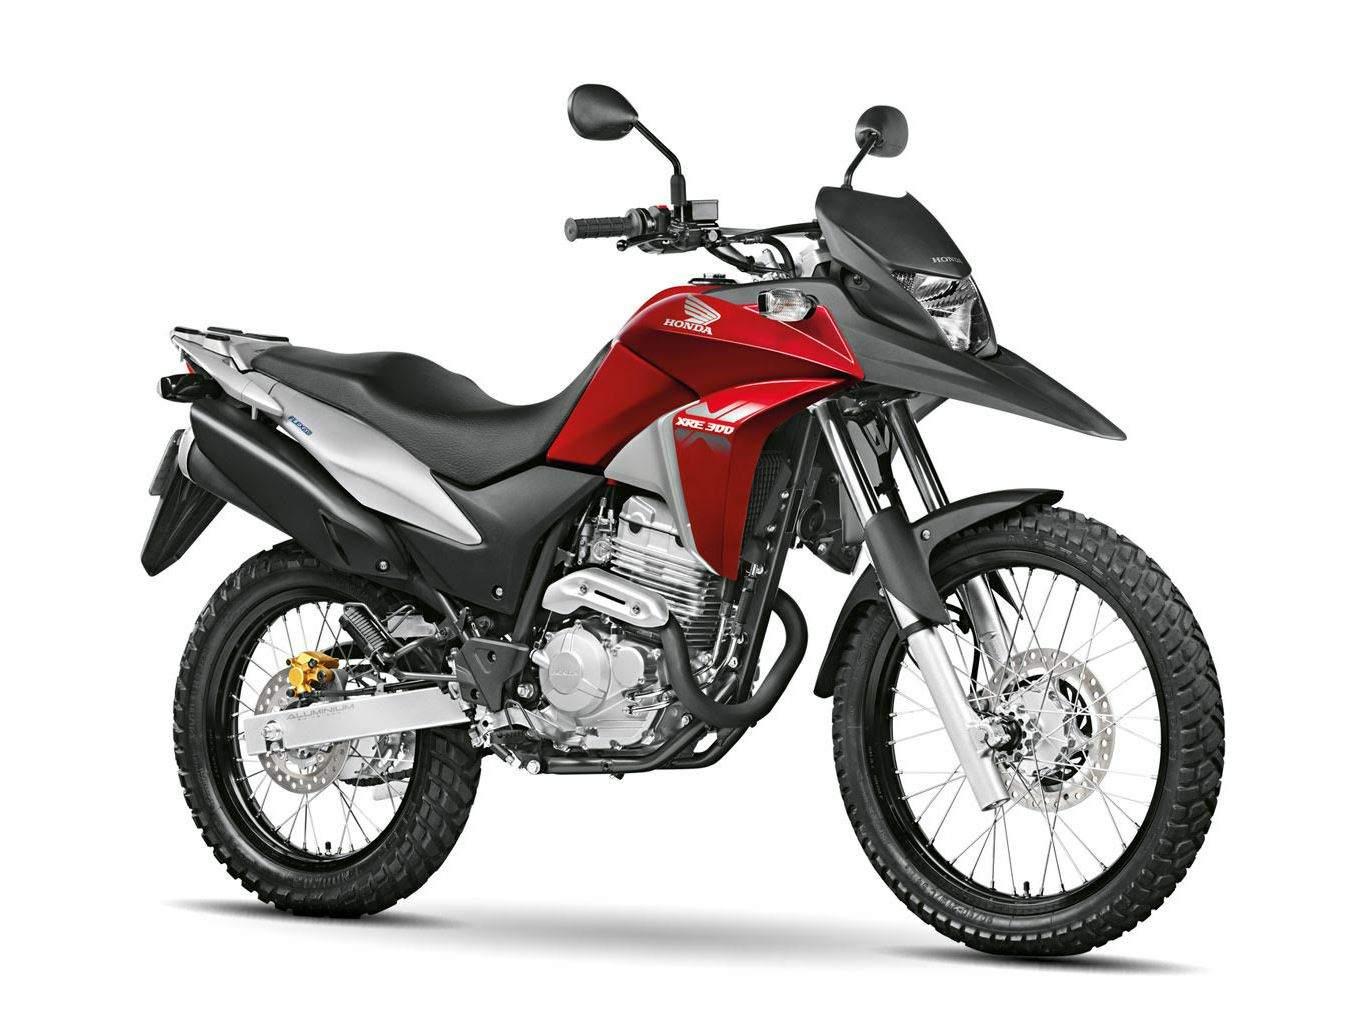 Honda Xre 300 Specs 2010 2011 2012 2013 2014 2015 2016 2017 2018 Autoevolution